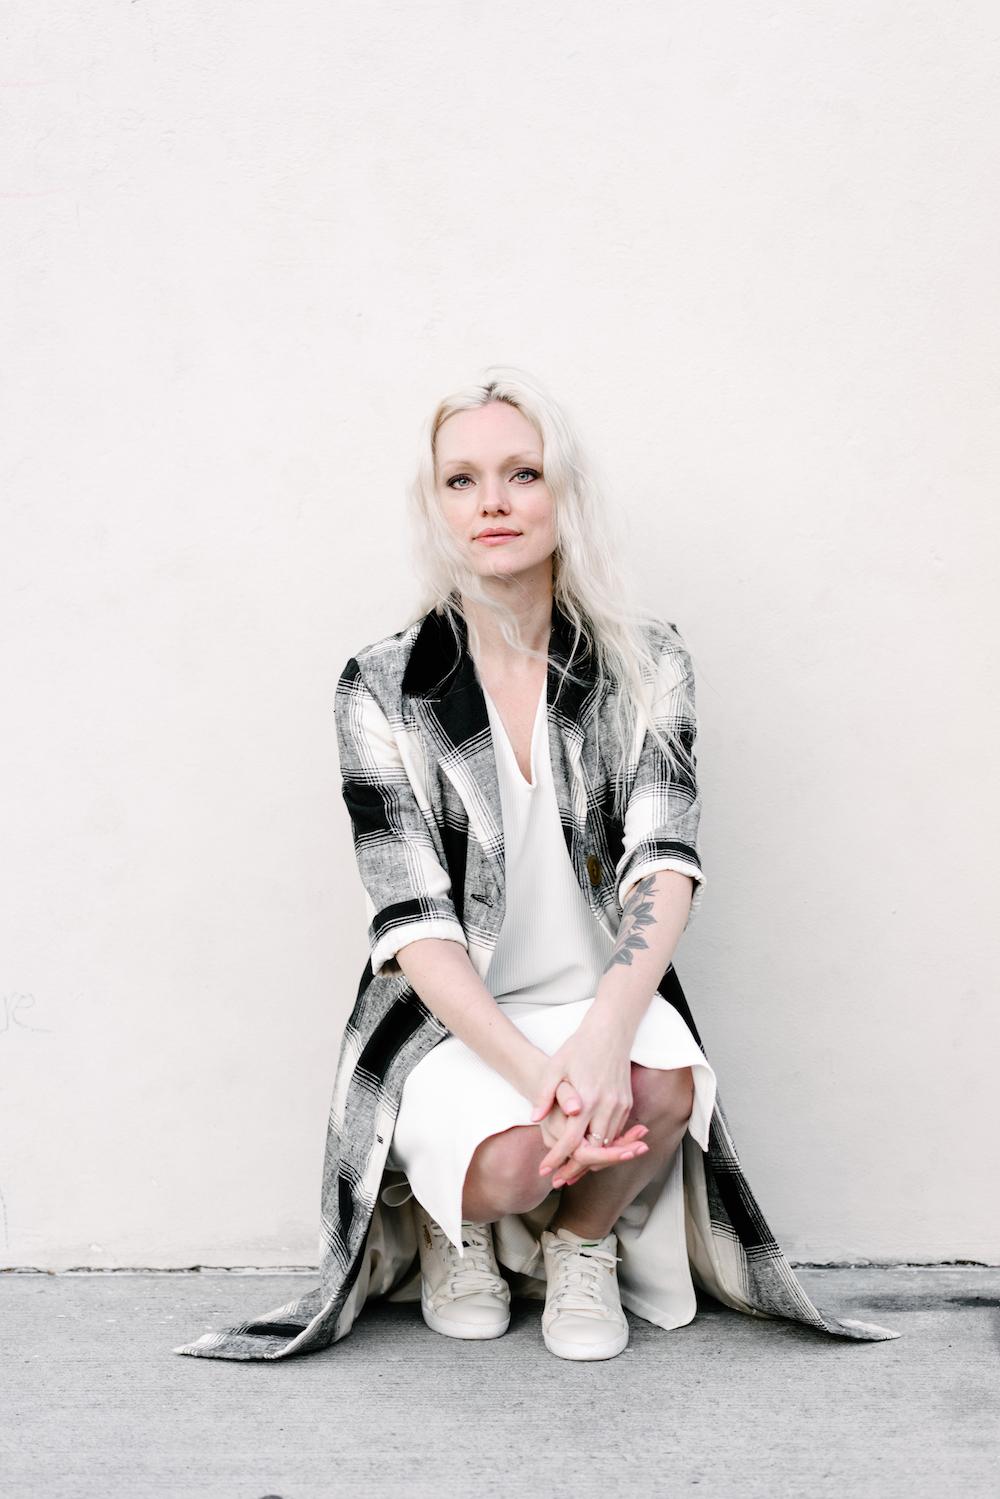 Image by Julia Hembree